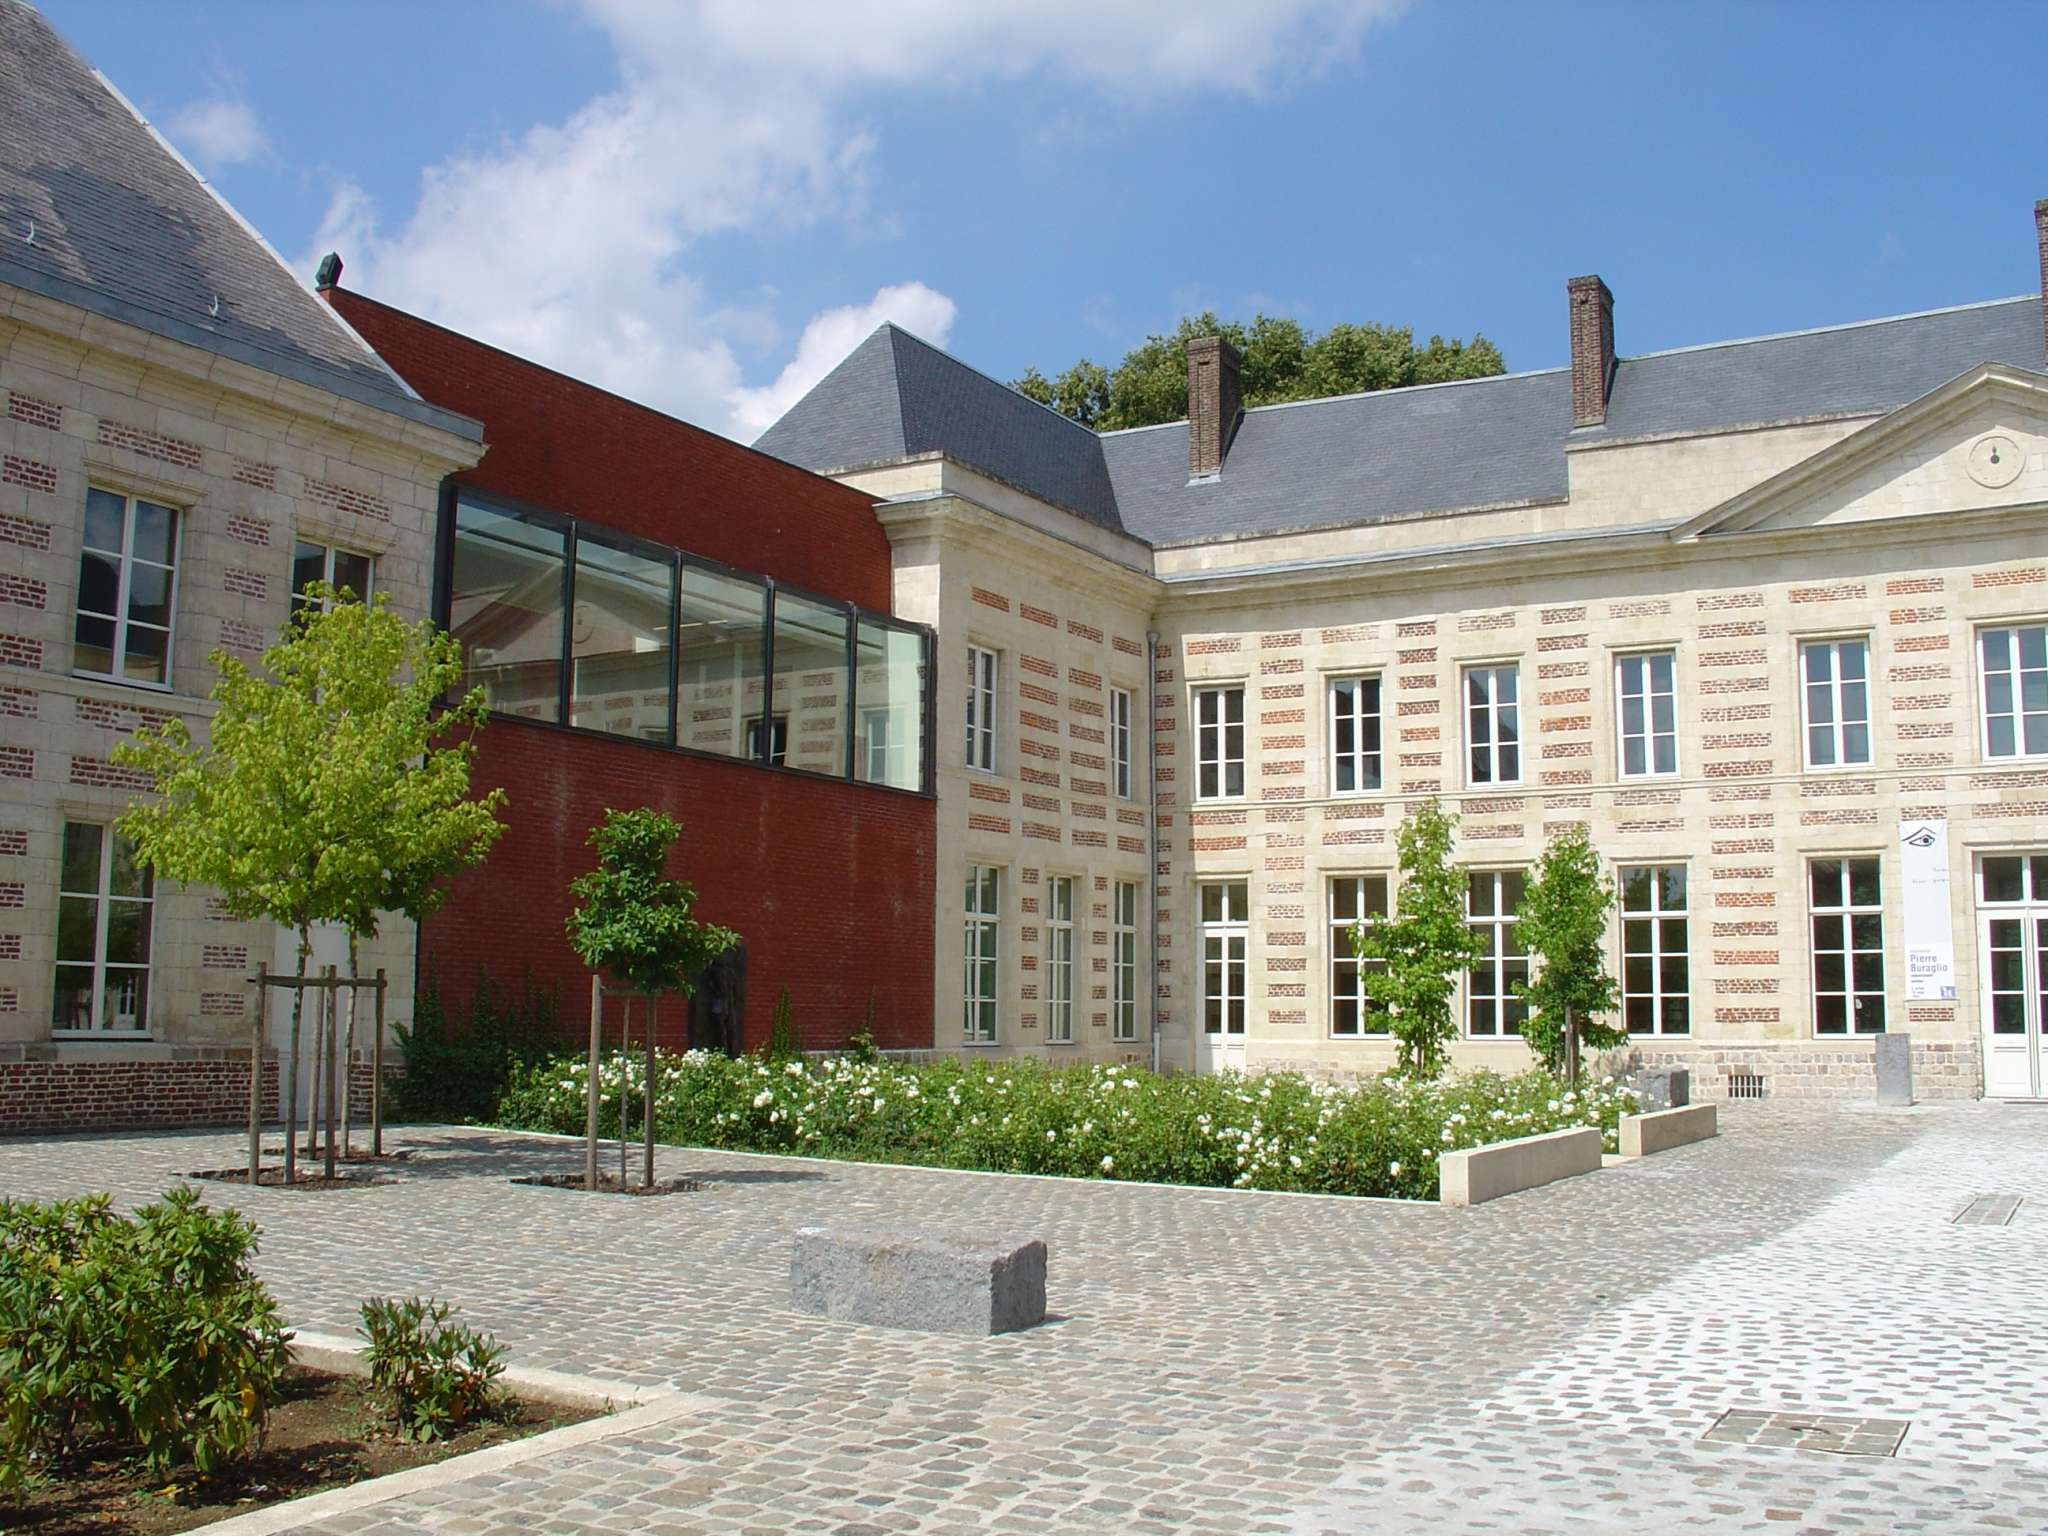 museedepartementalhenrimatisselecatteau-cambresis